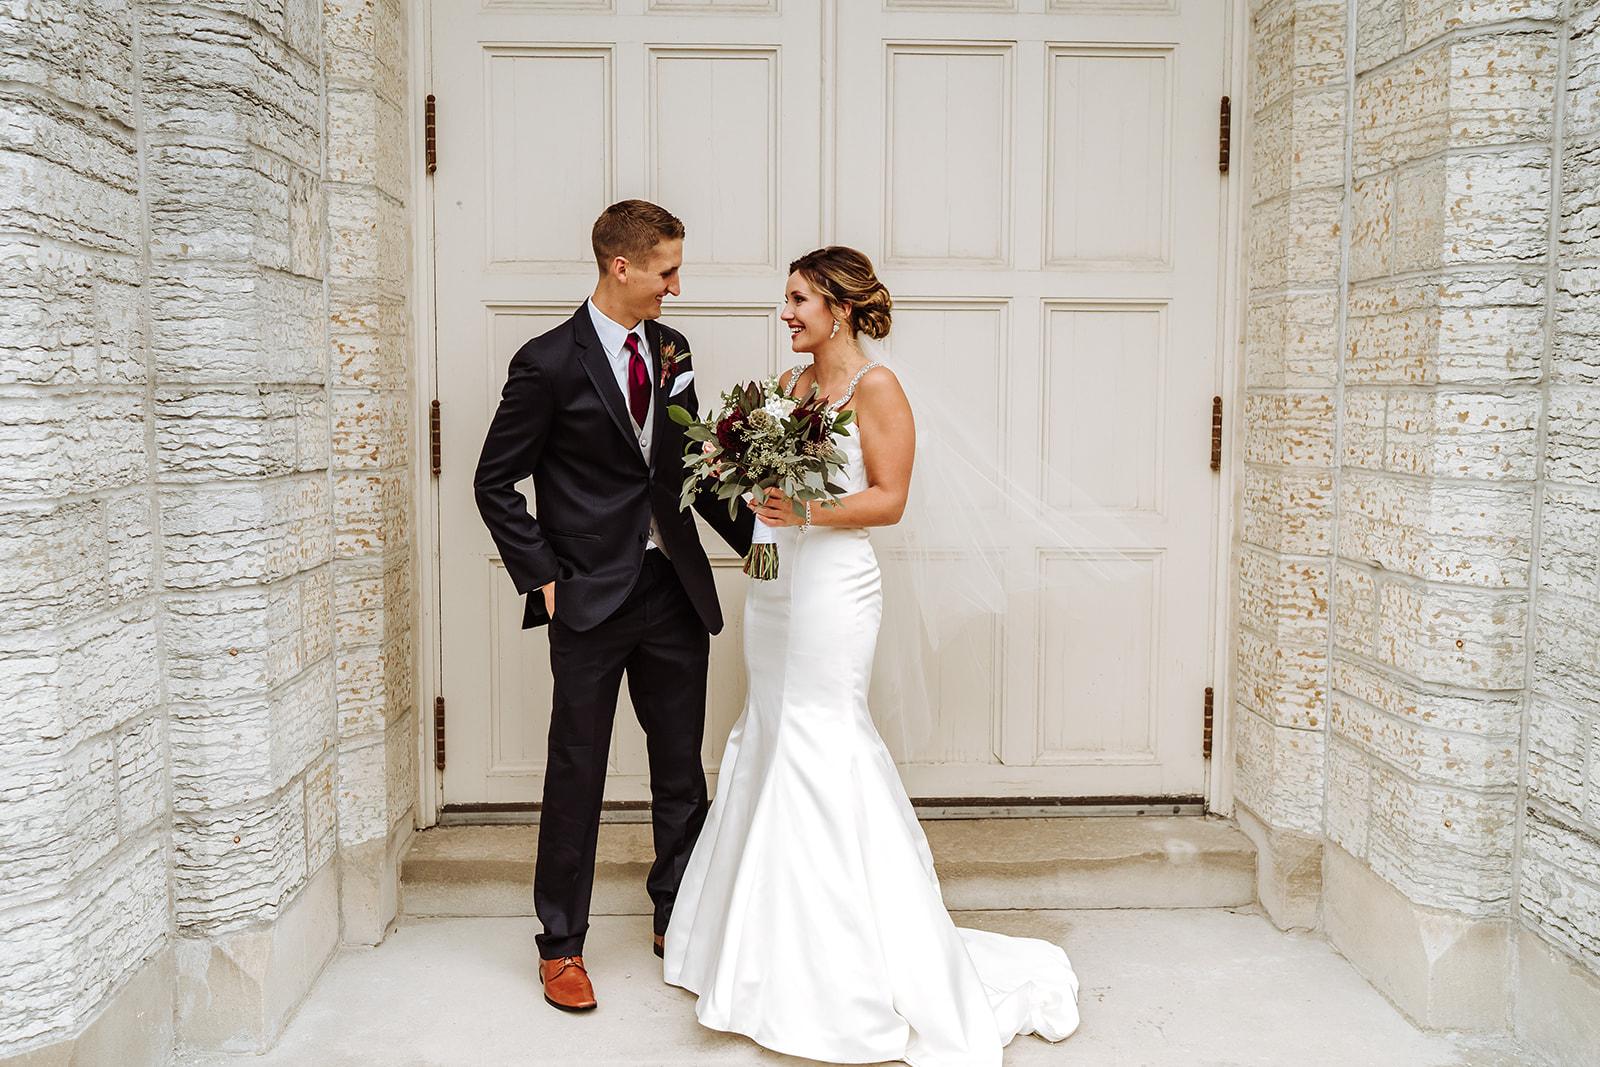 Scott and Andrea Wedding 2018-178.jpg